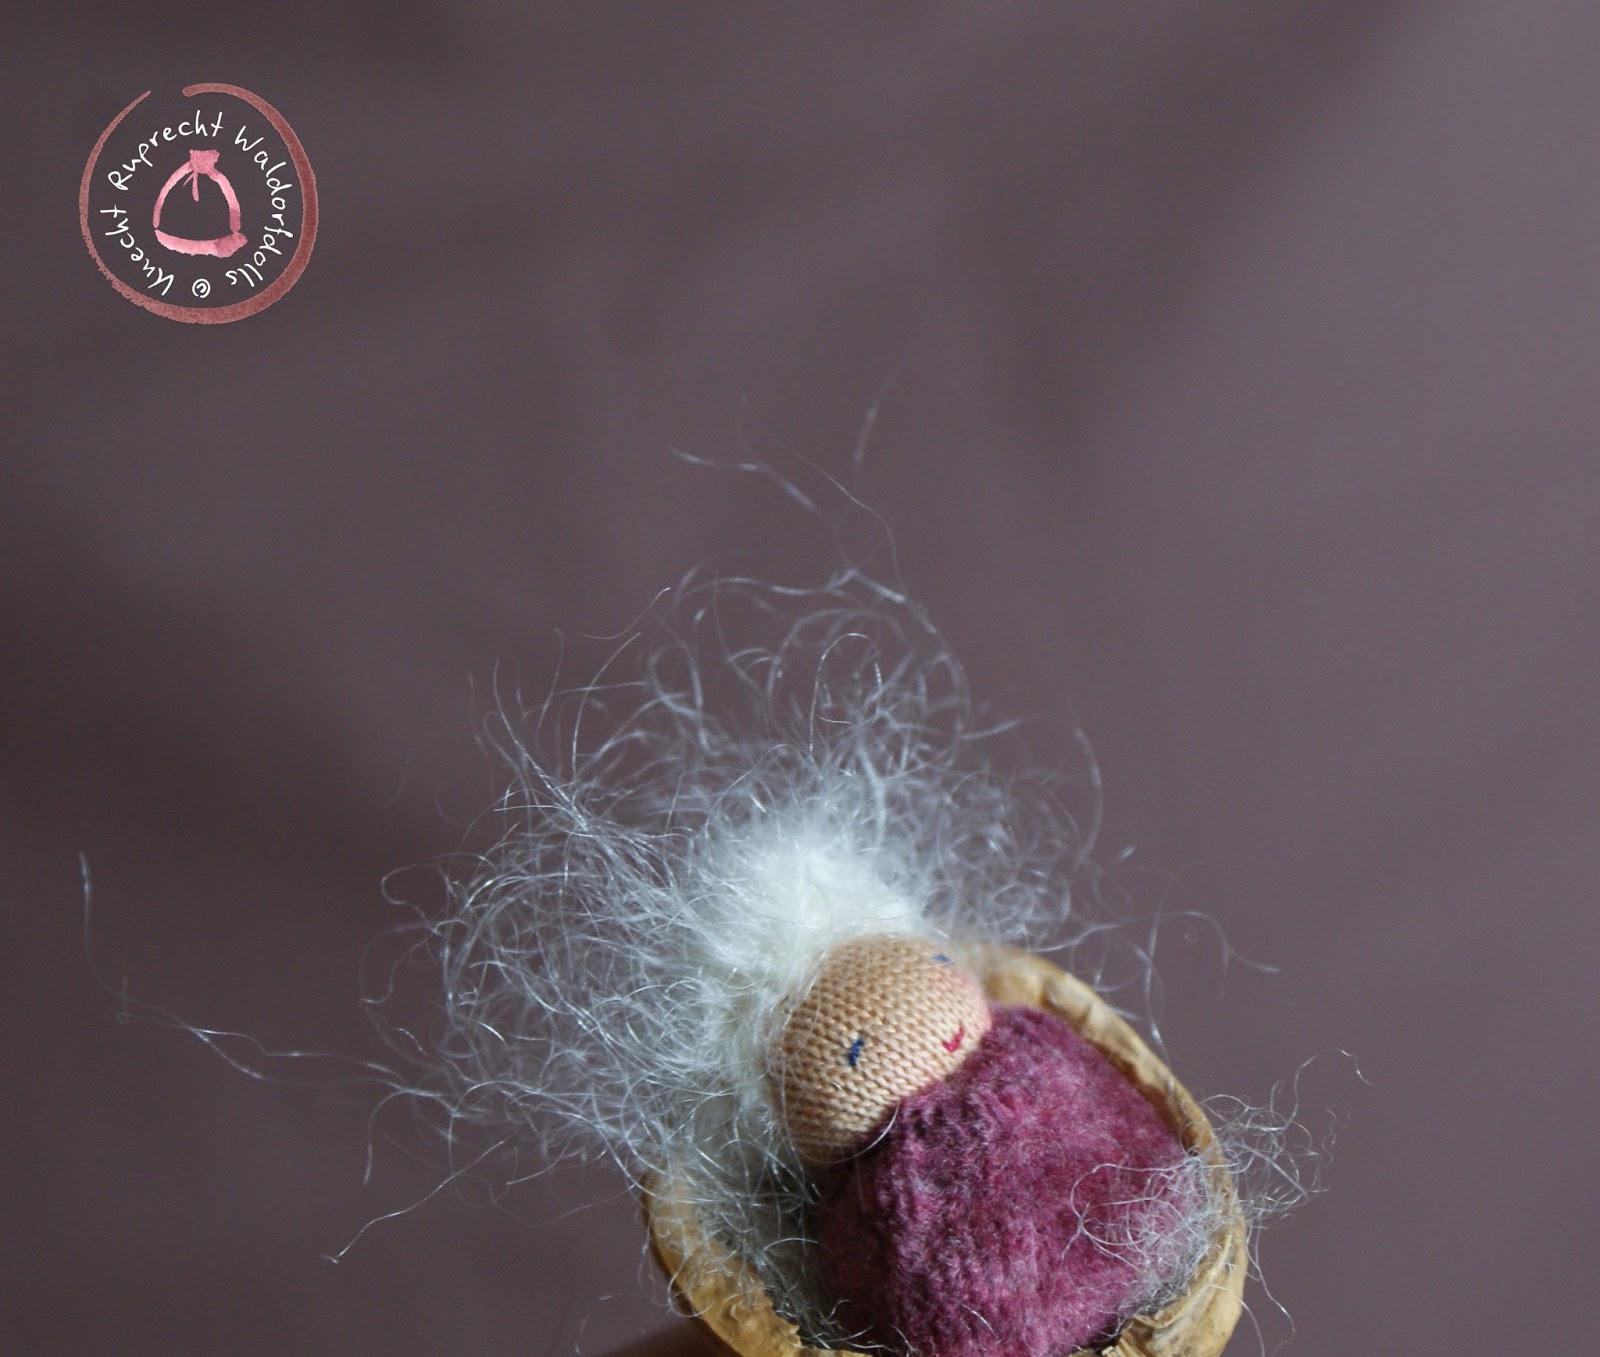 Waldorf Walnut Baby - Baby in a Nutshell - Walnut Baby